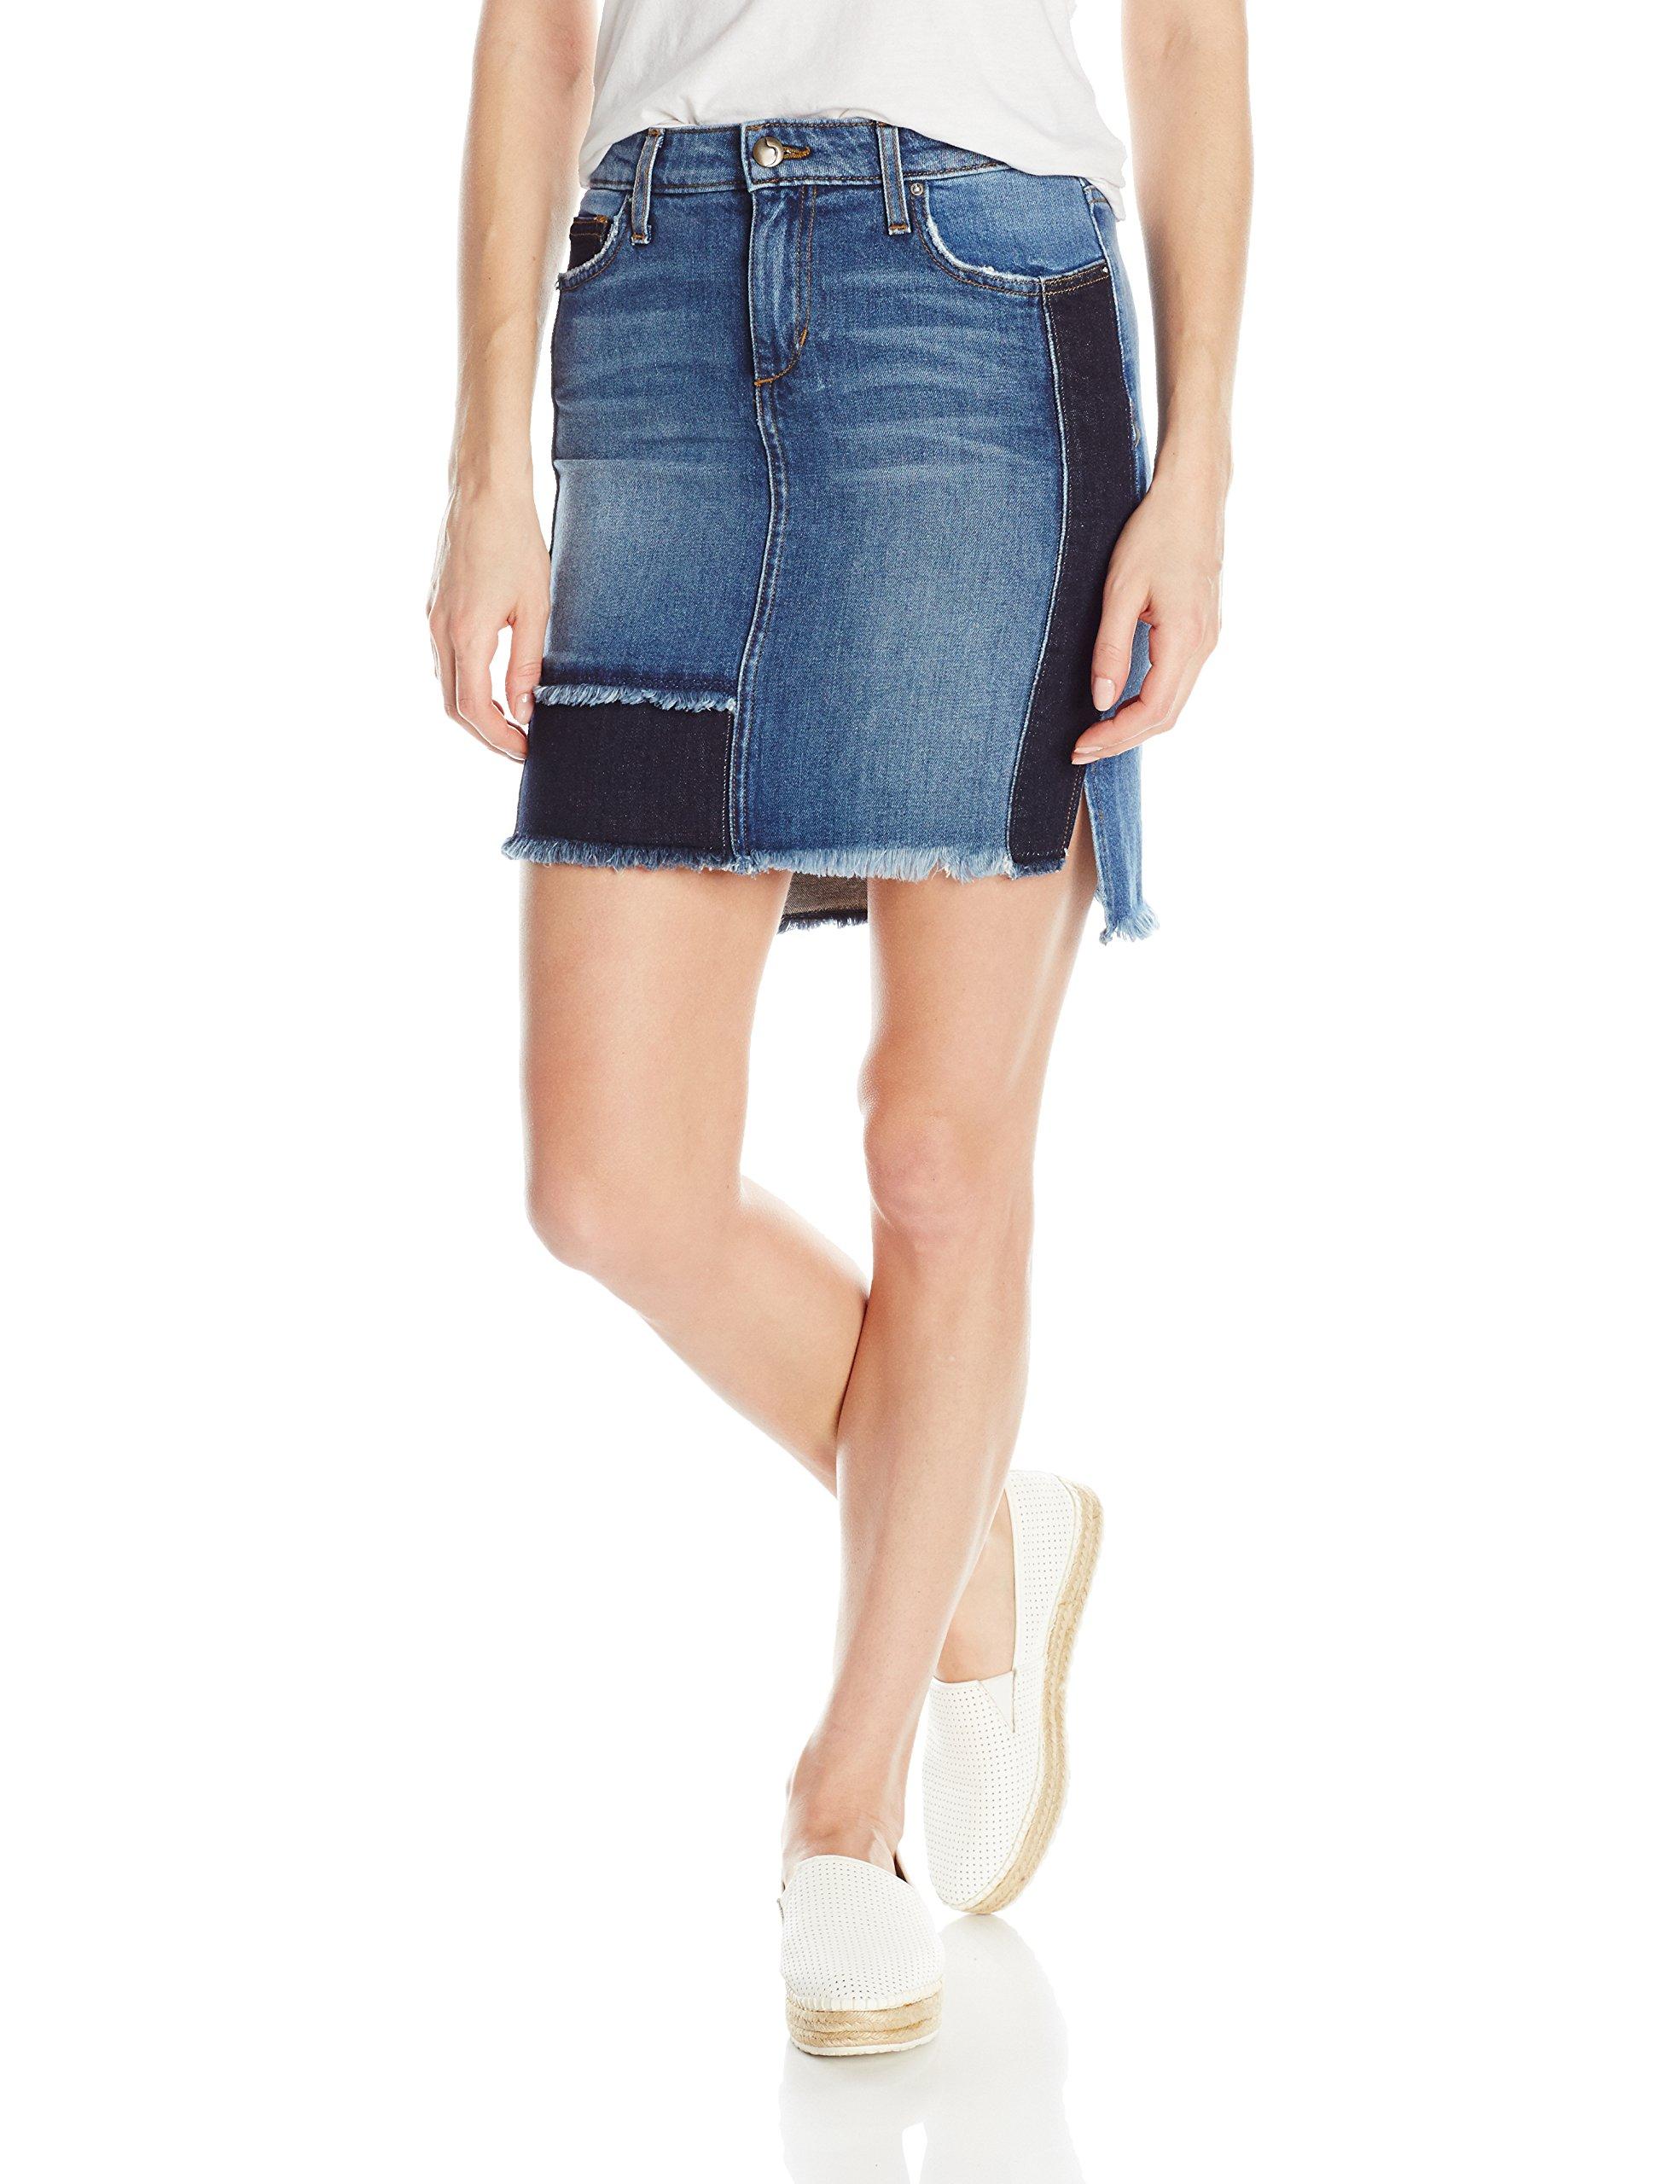 Joe's Jeans Women's High Rise Pencil Skirt, Kars, 29 by Joe's Jeans